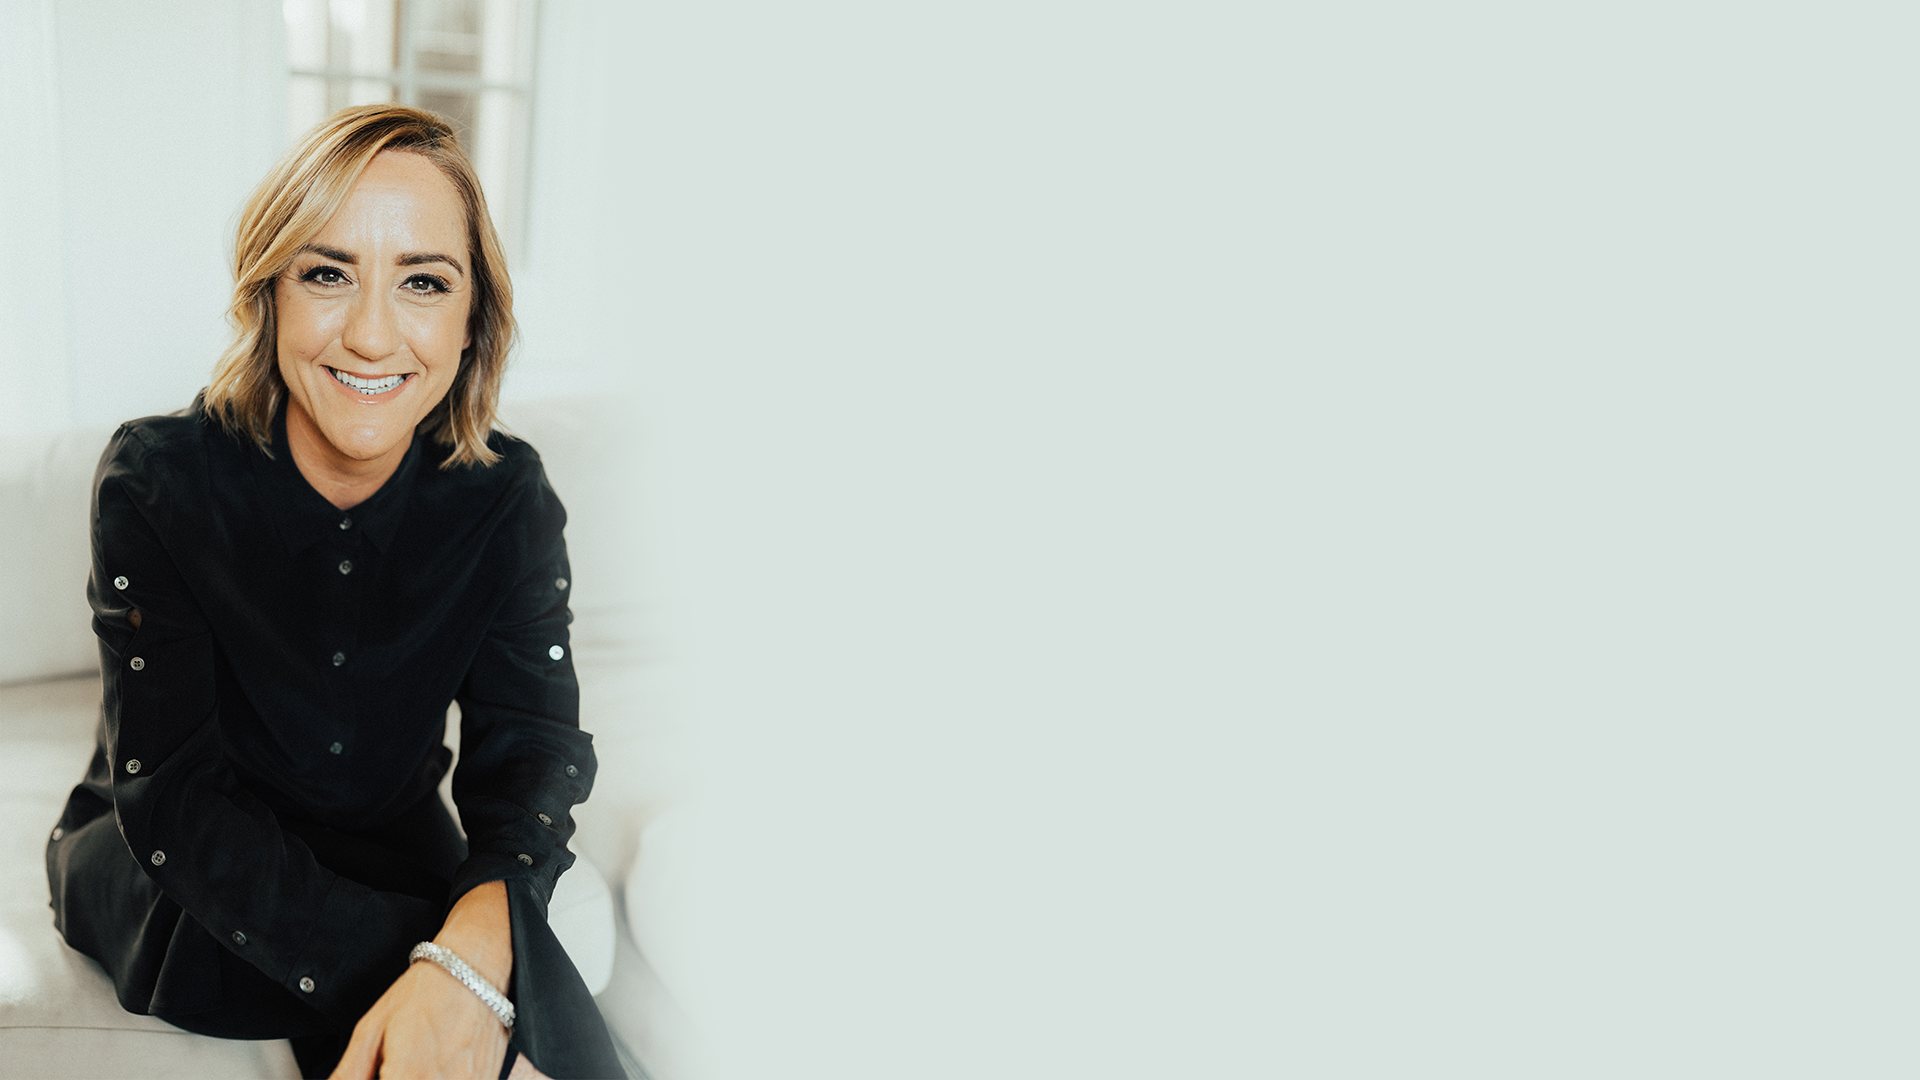 Christine Caine Online Courses